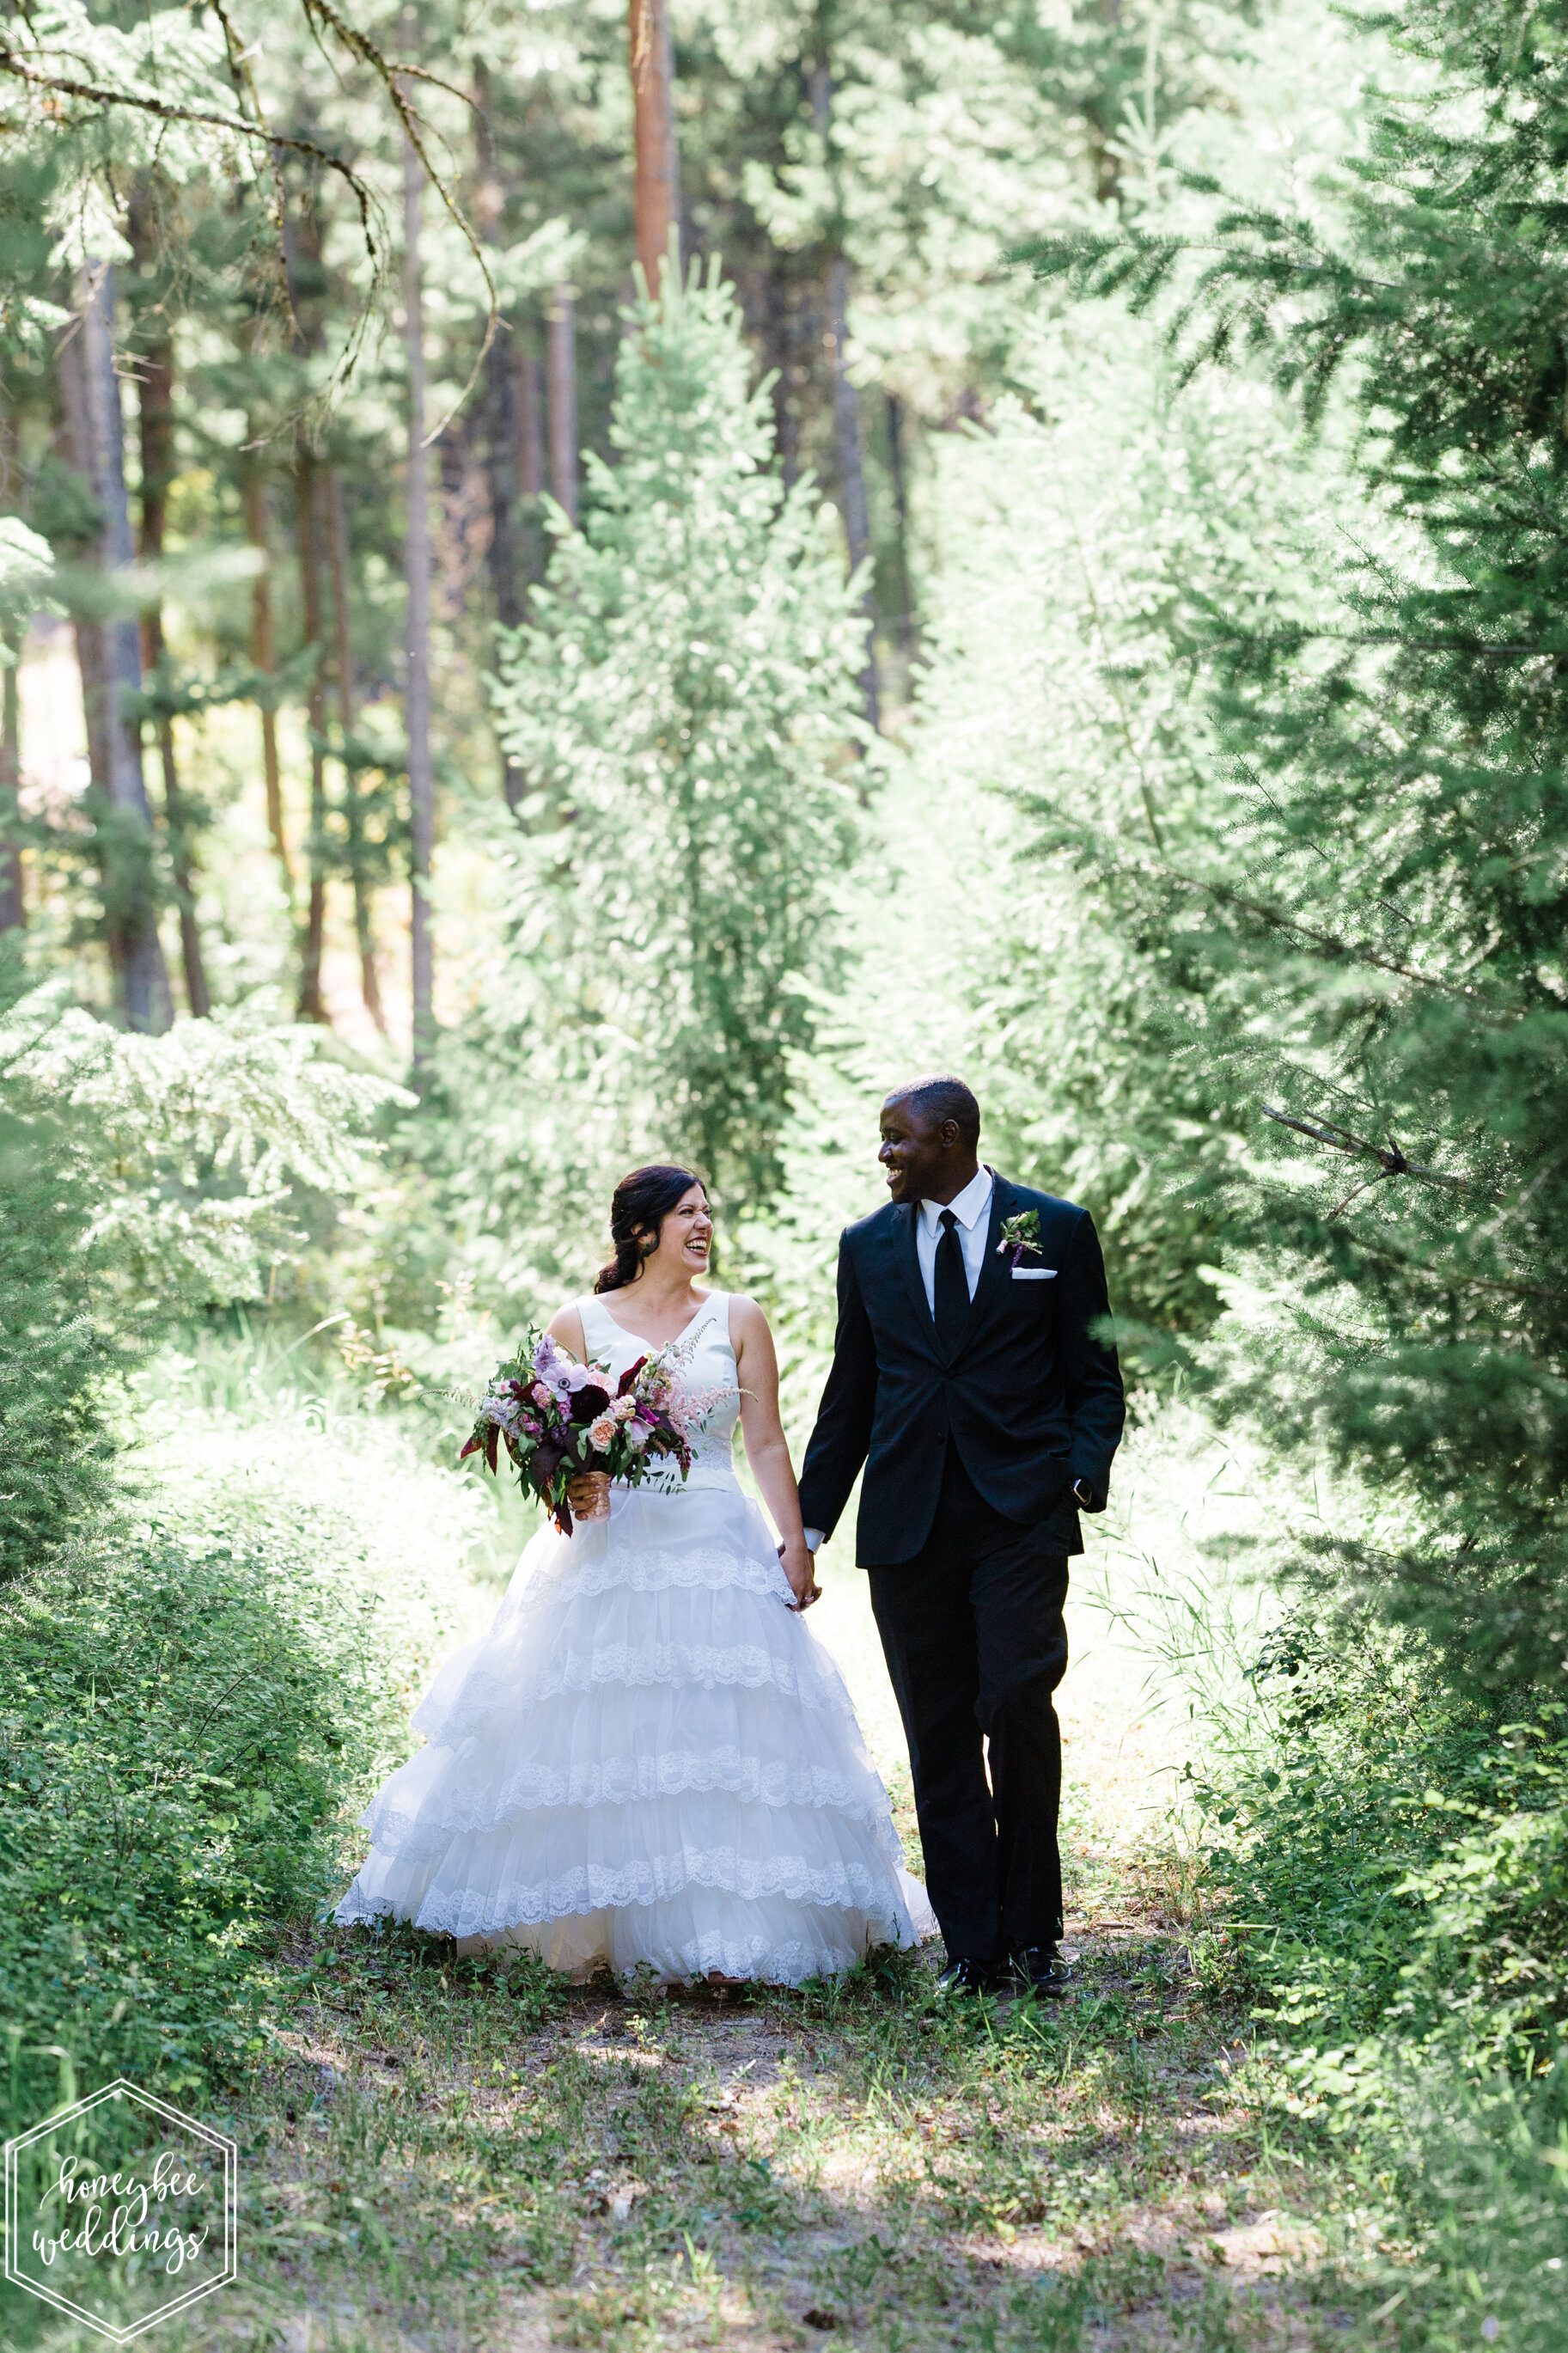 109White Raven Wedding_Montana Wedding Photographer_Rebekah & Likom_Honeybee Weddings_July 27, 2019-329.jpg